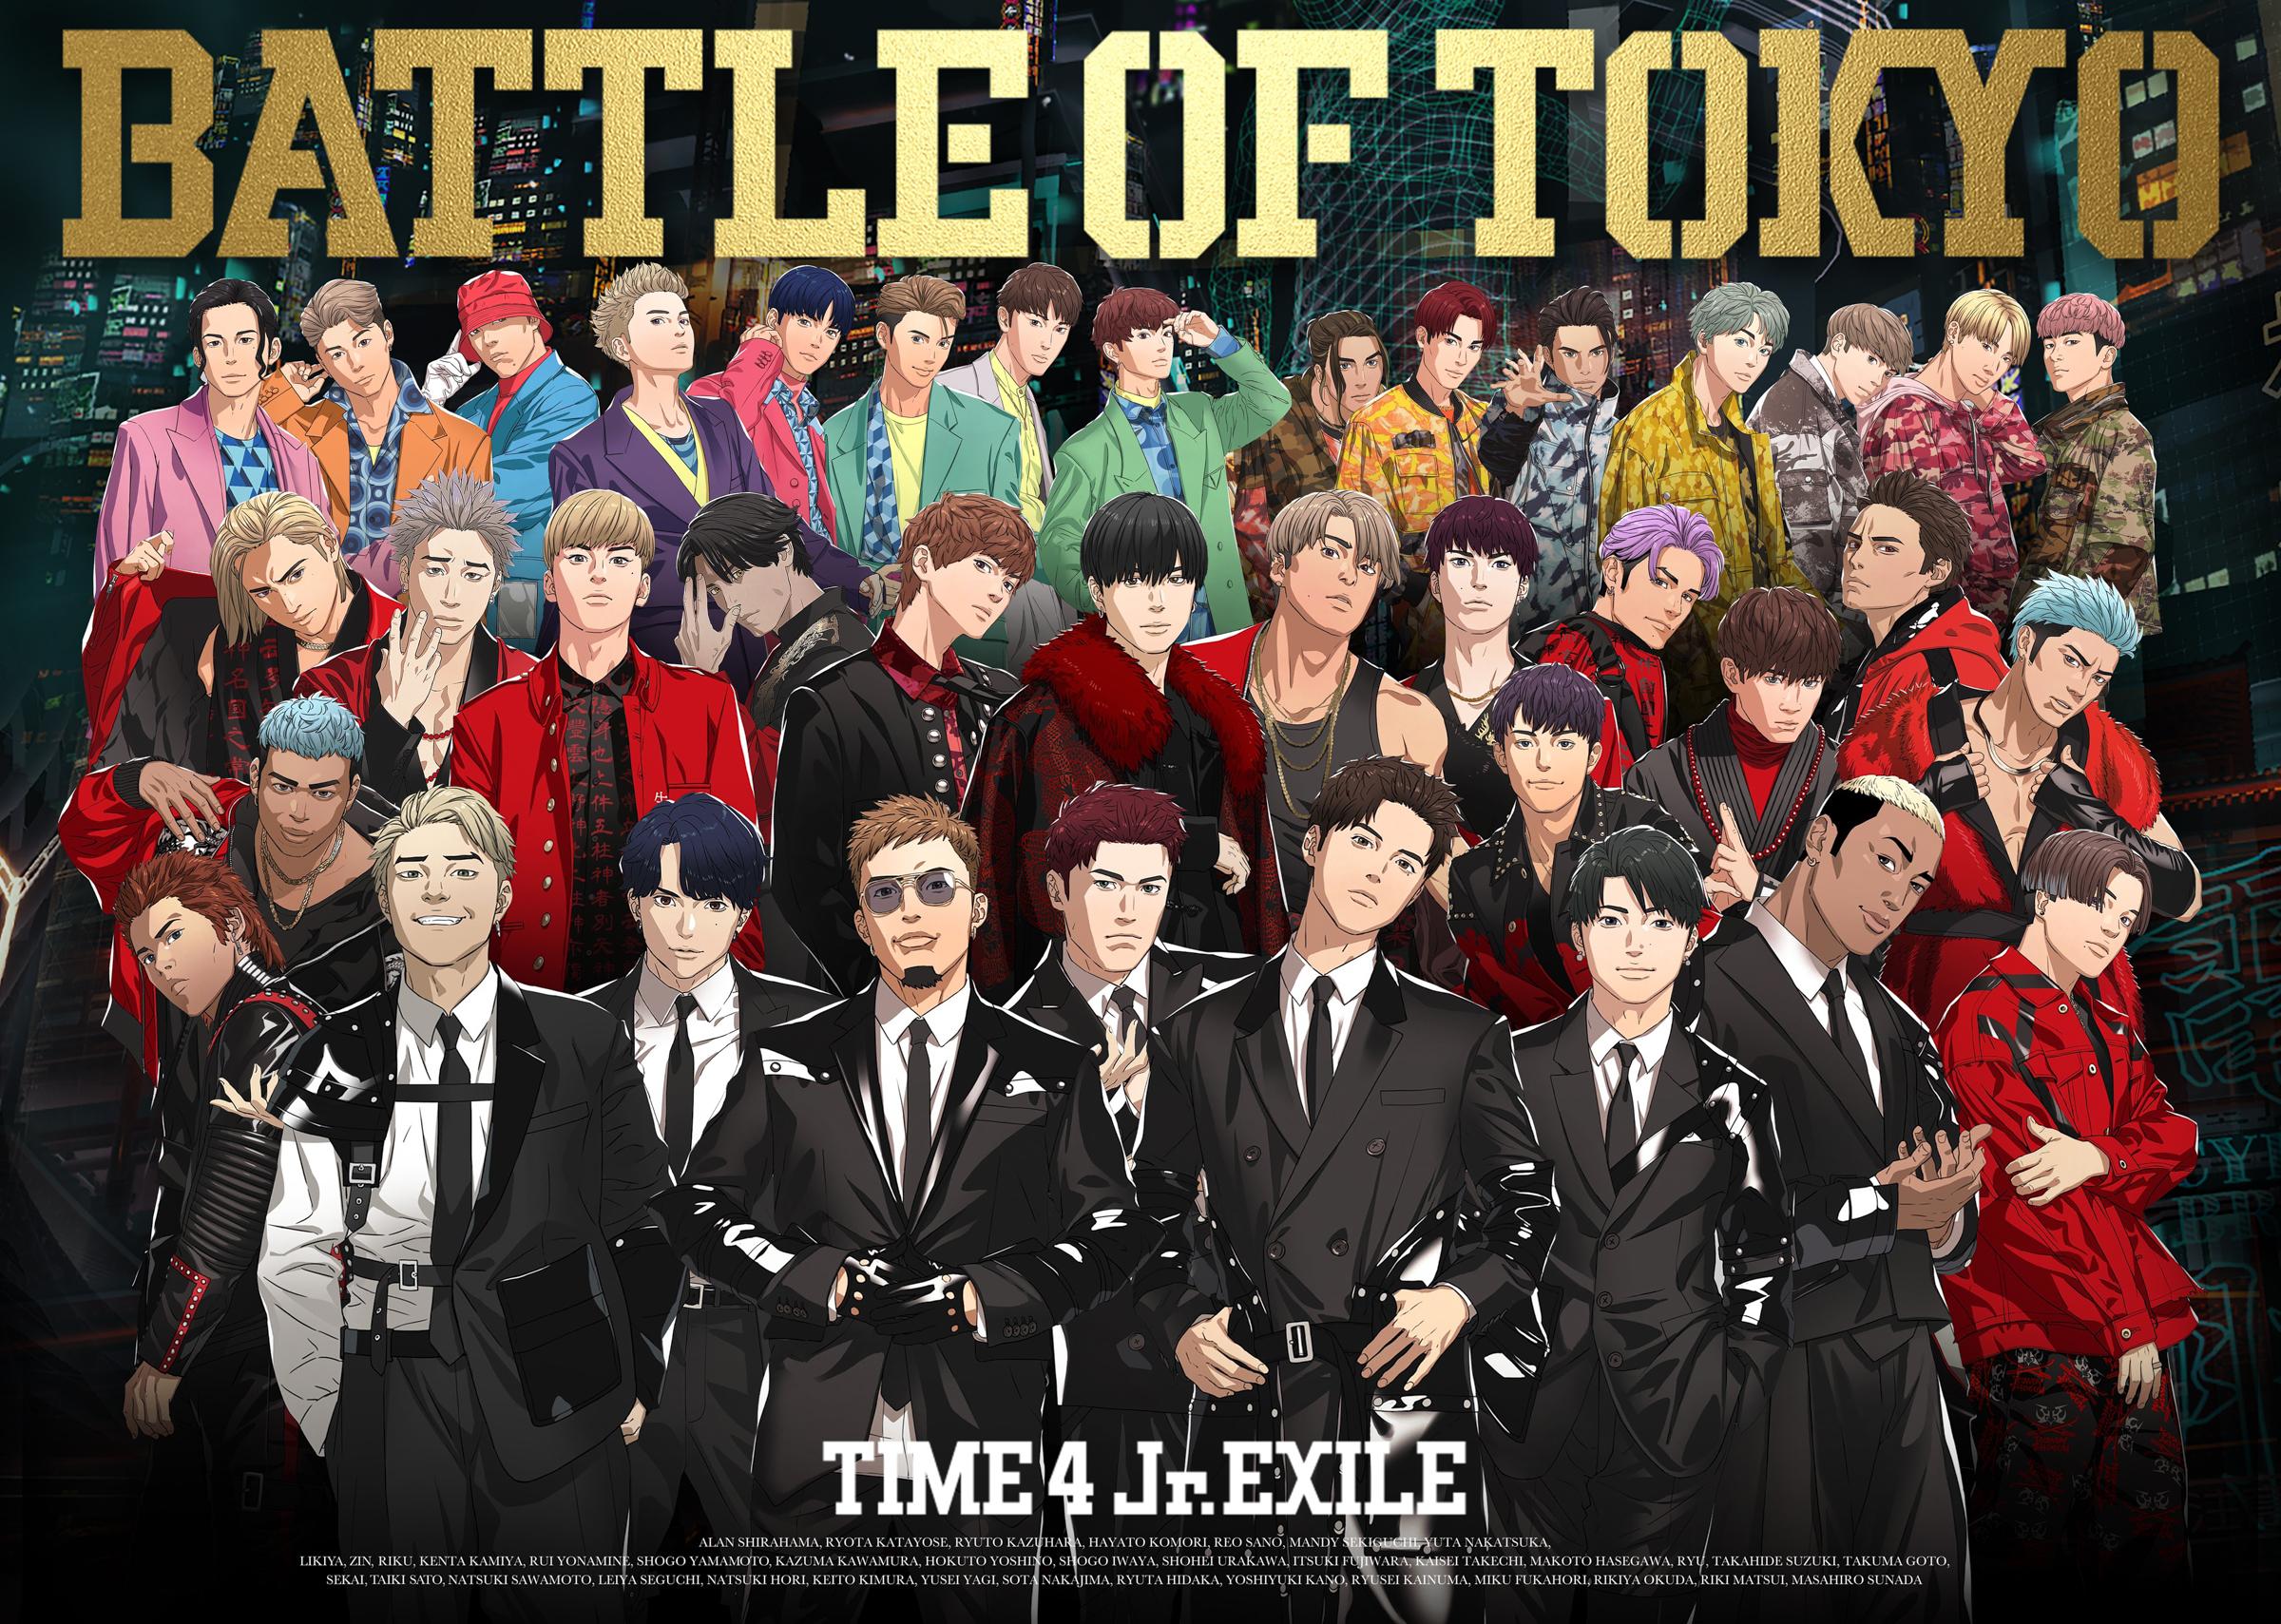 "LDHの新プロジェクト「BATTLE OF TOKYO」でJr.EXILEがアニメ化!4つのチームが架空の未来都市""超東京""で暴れまわる"